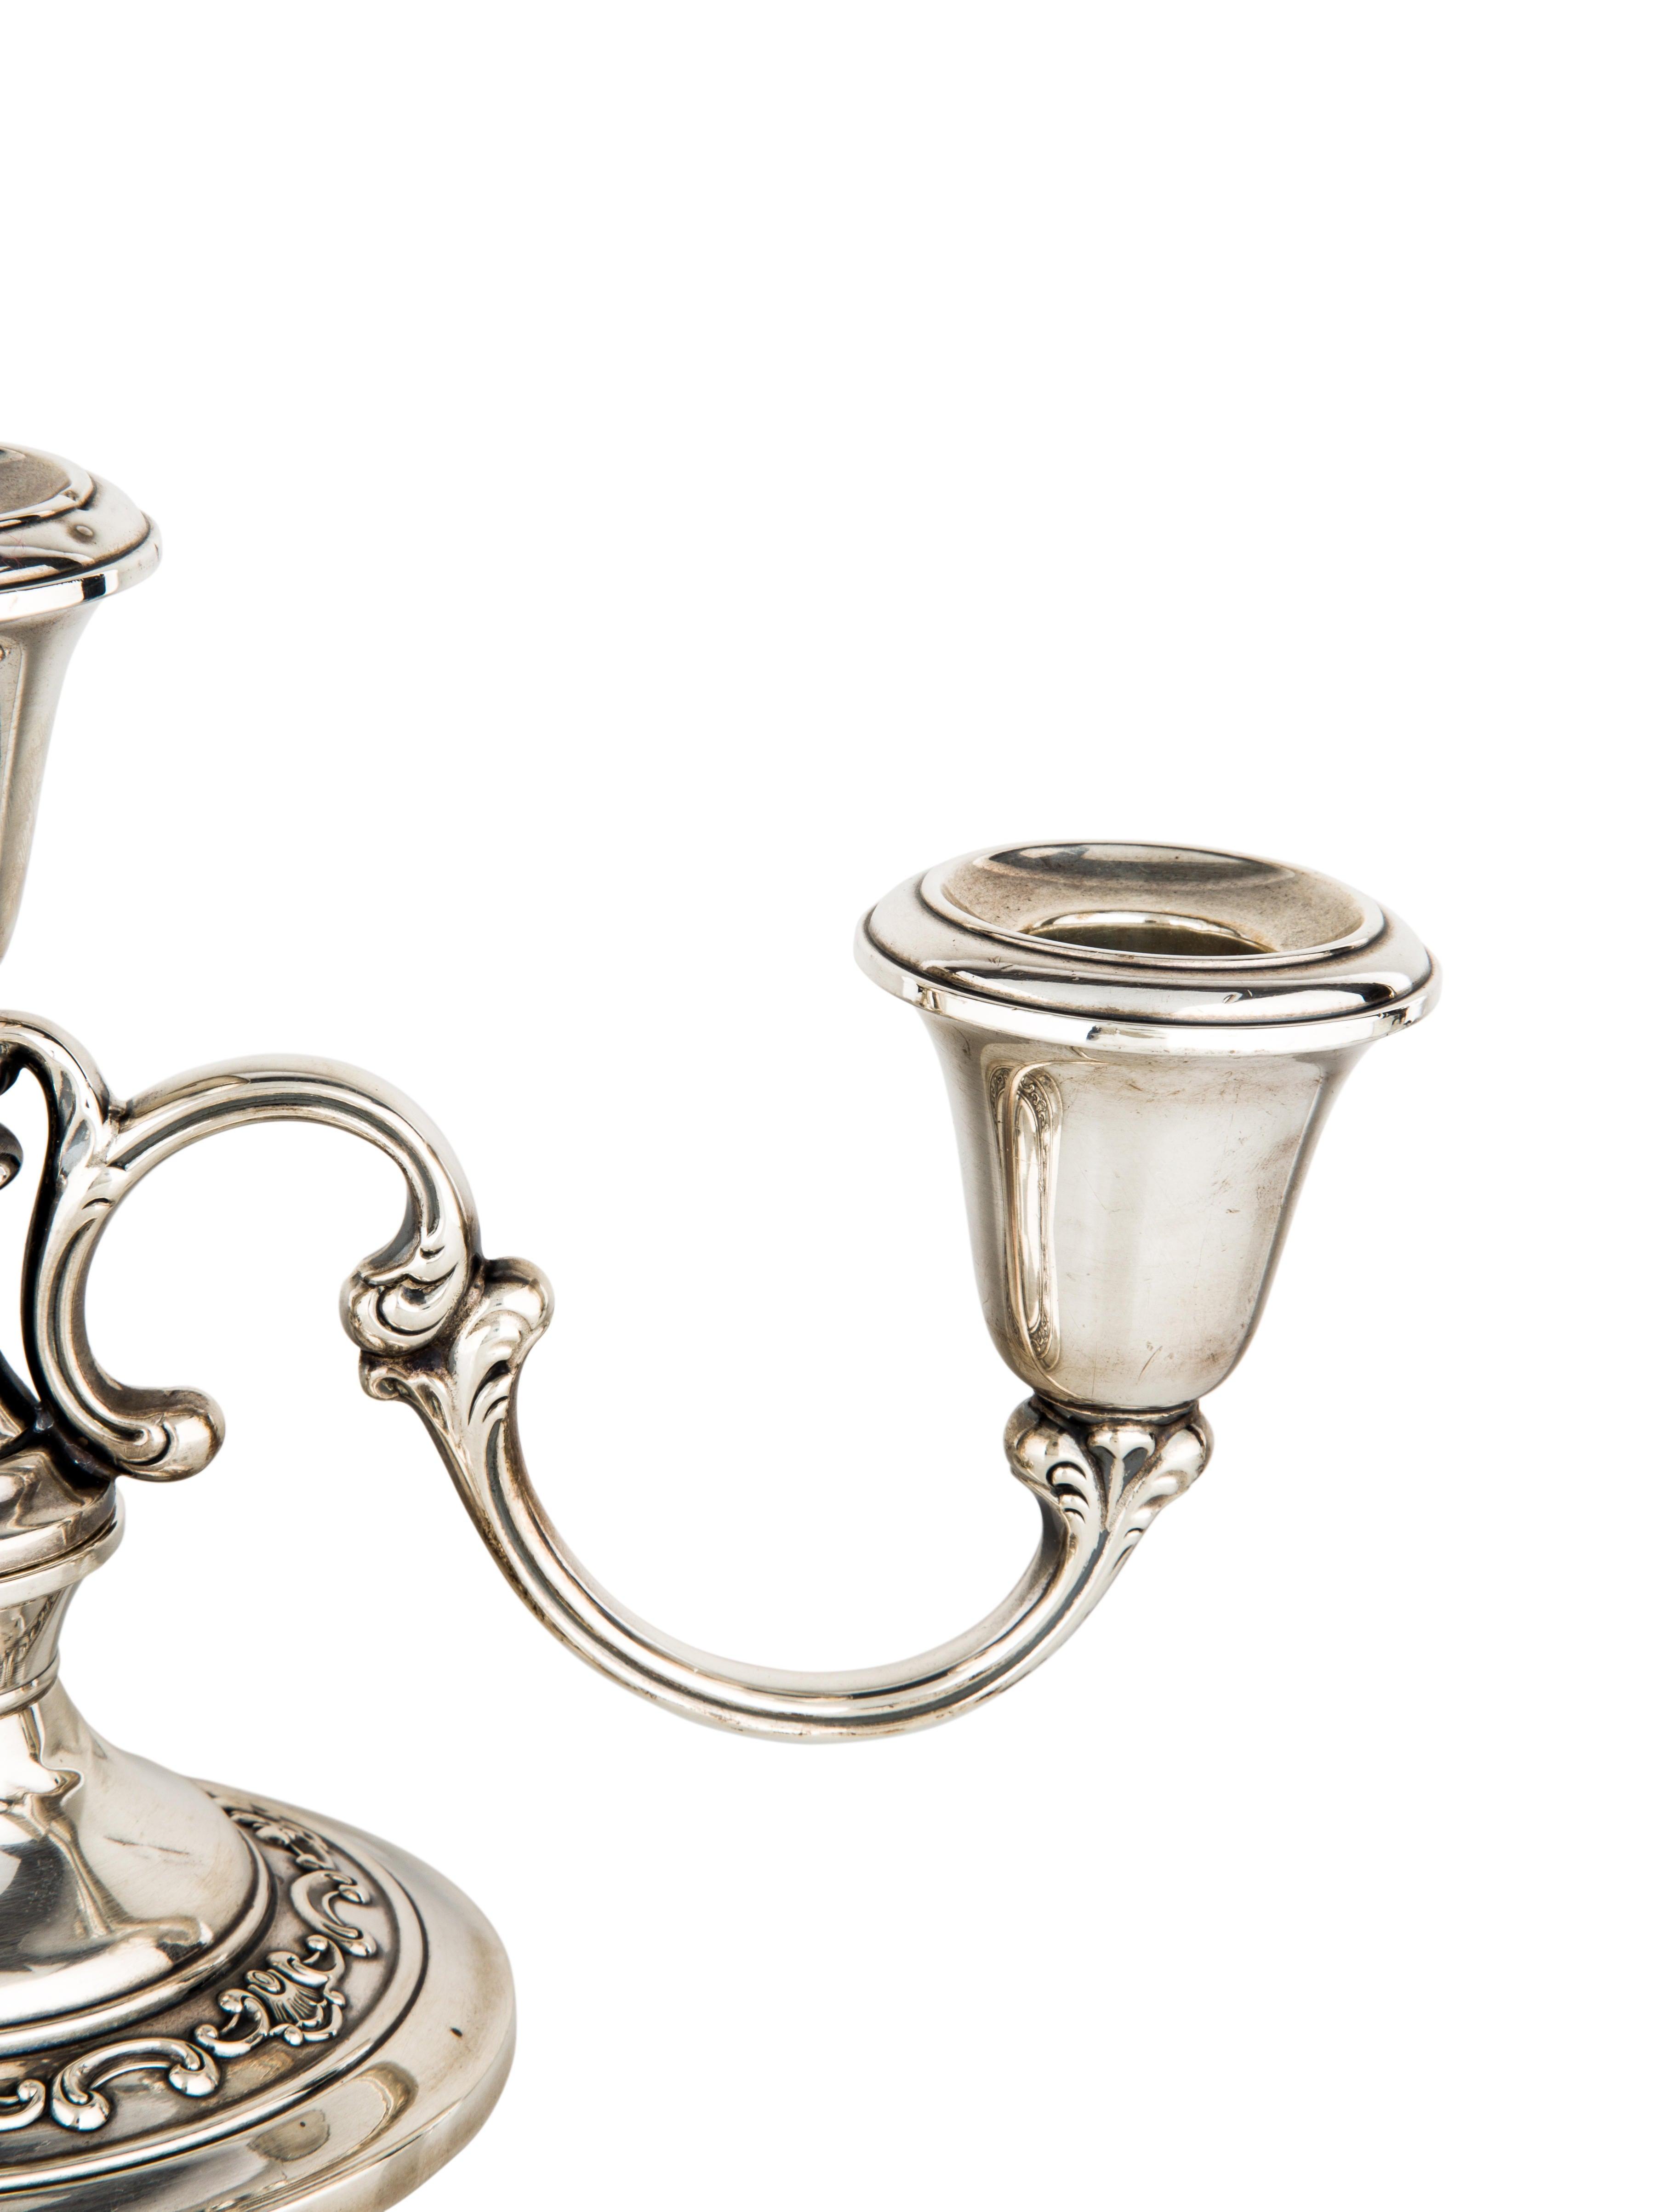 Gorham pair of sterling silver strasbourg candelabra for Artistic accents genuine silver decoration